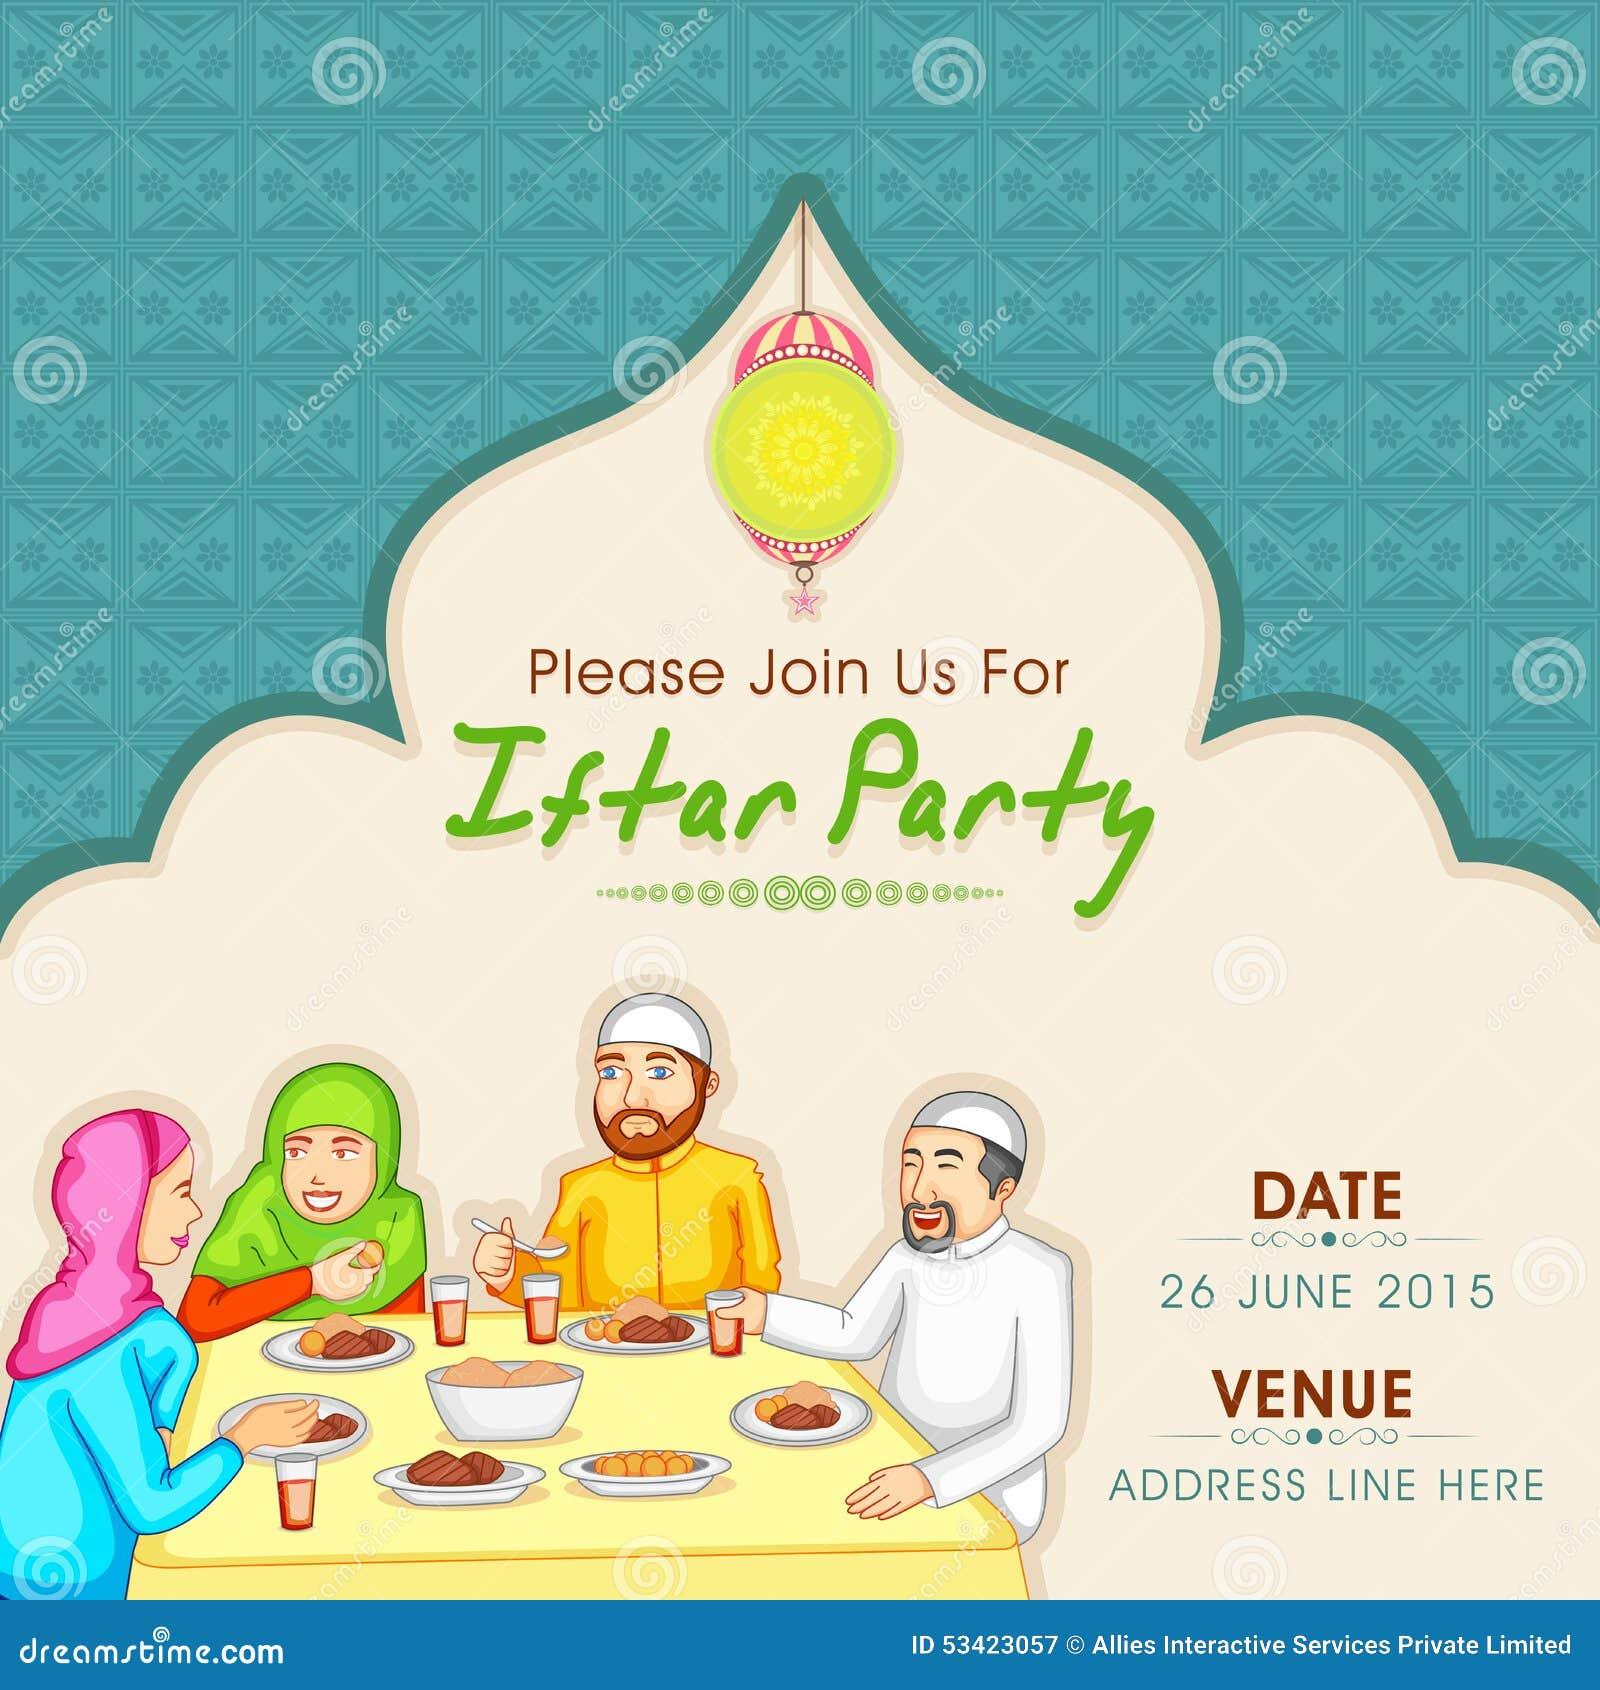 Ramadan Iftar Stock Illustrations – 2,523 Ramadan Iftar Stock ... for Ramadan Iftar Clipart  545xkb